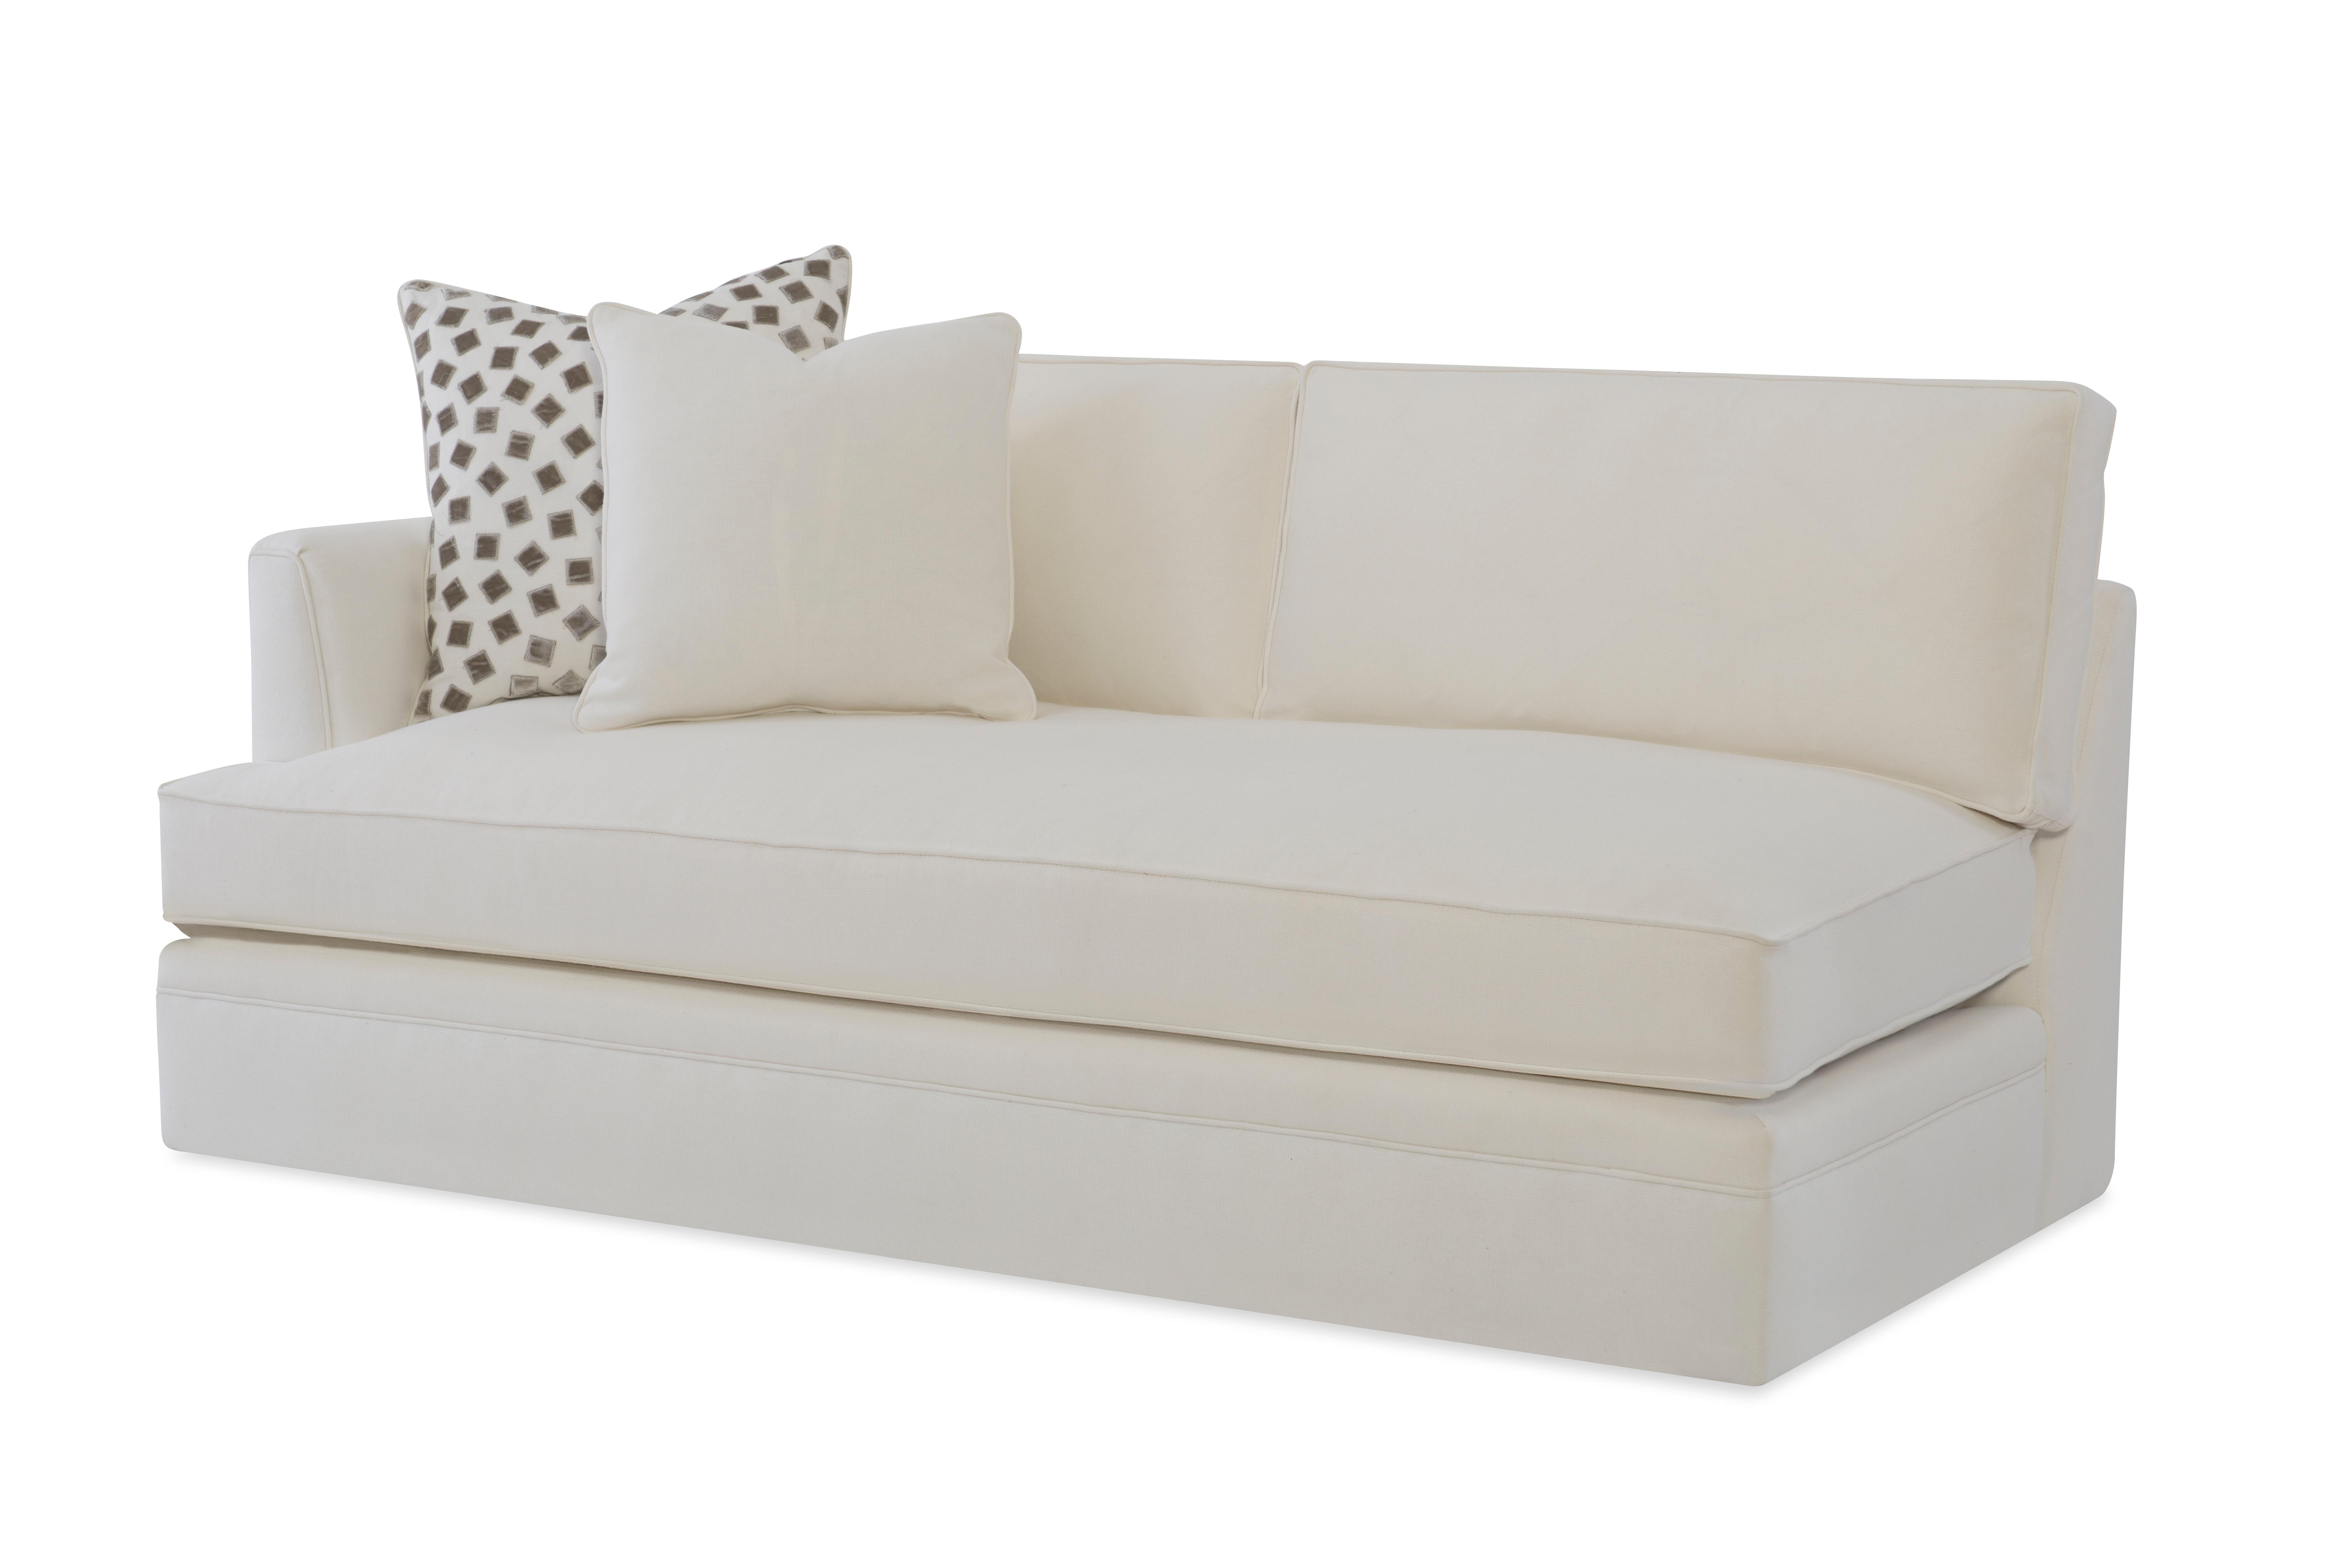 Sofa I Lder Custom With Sofa I Lder U With Sofa I Lder Massage